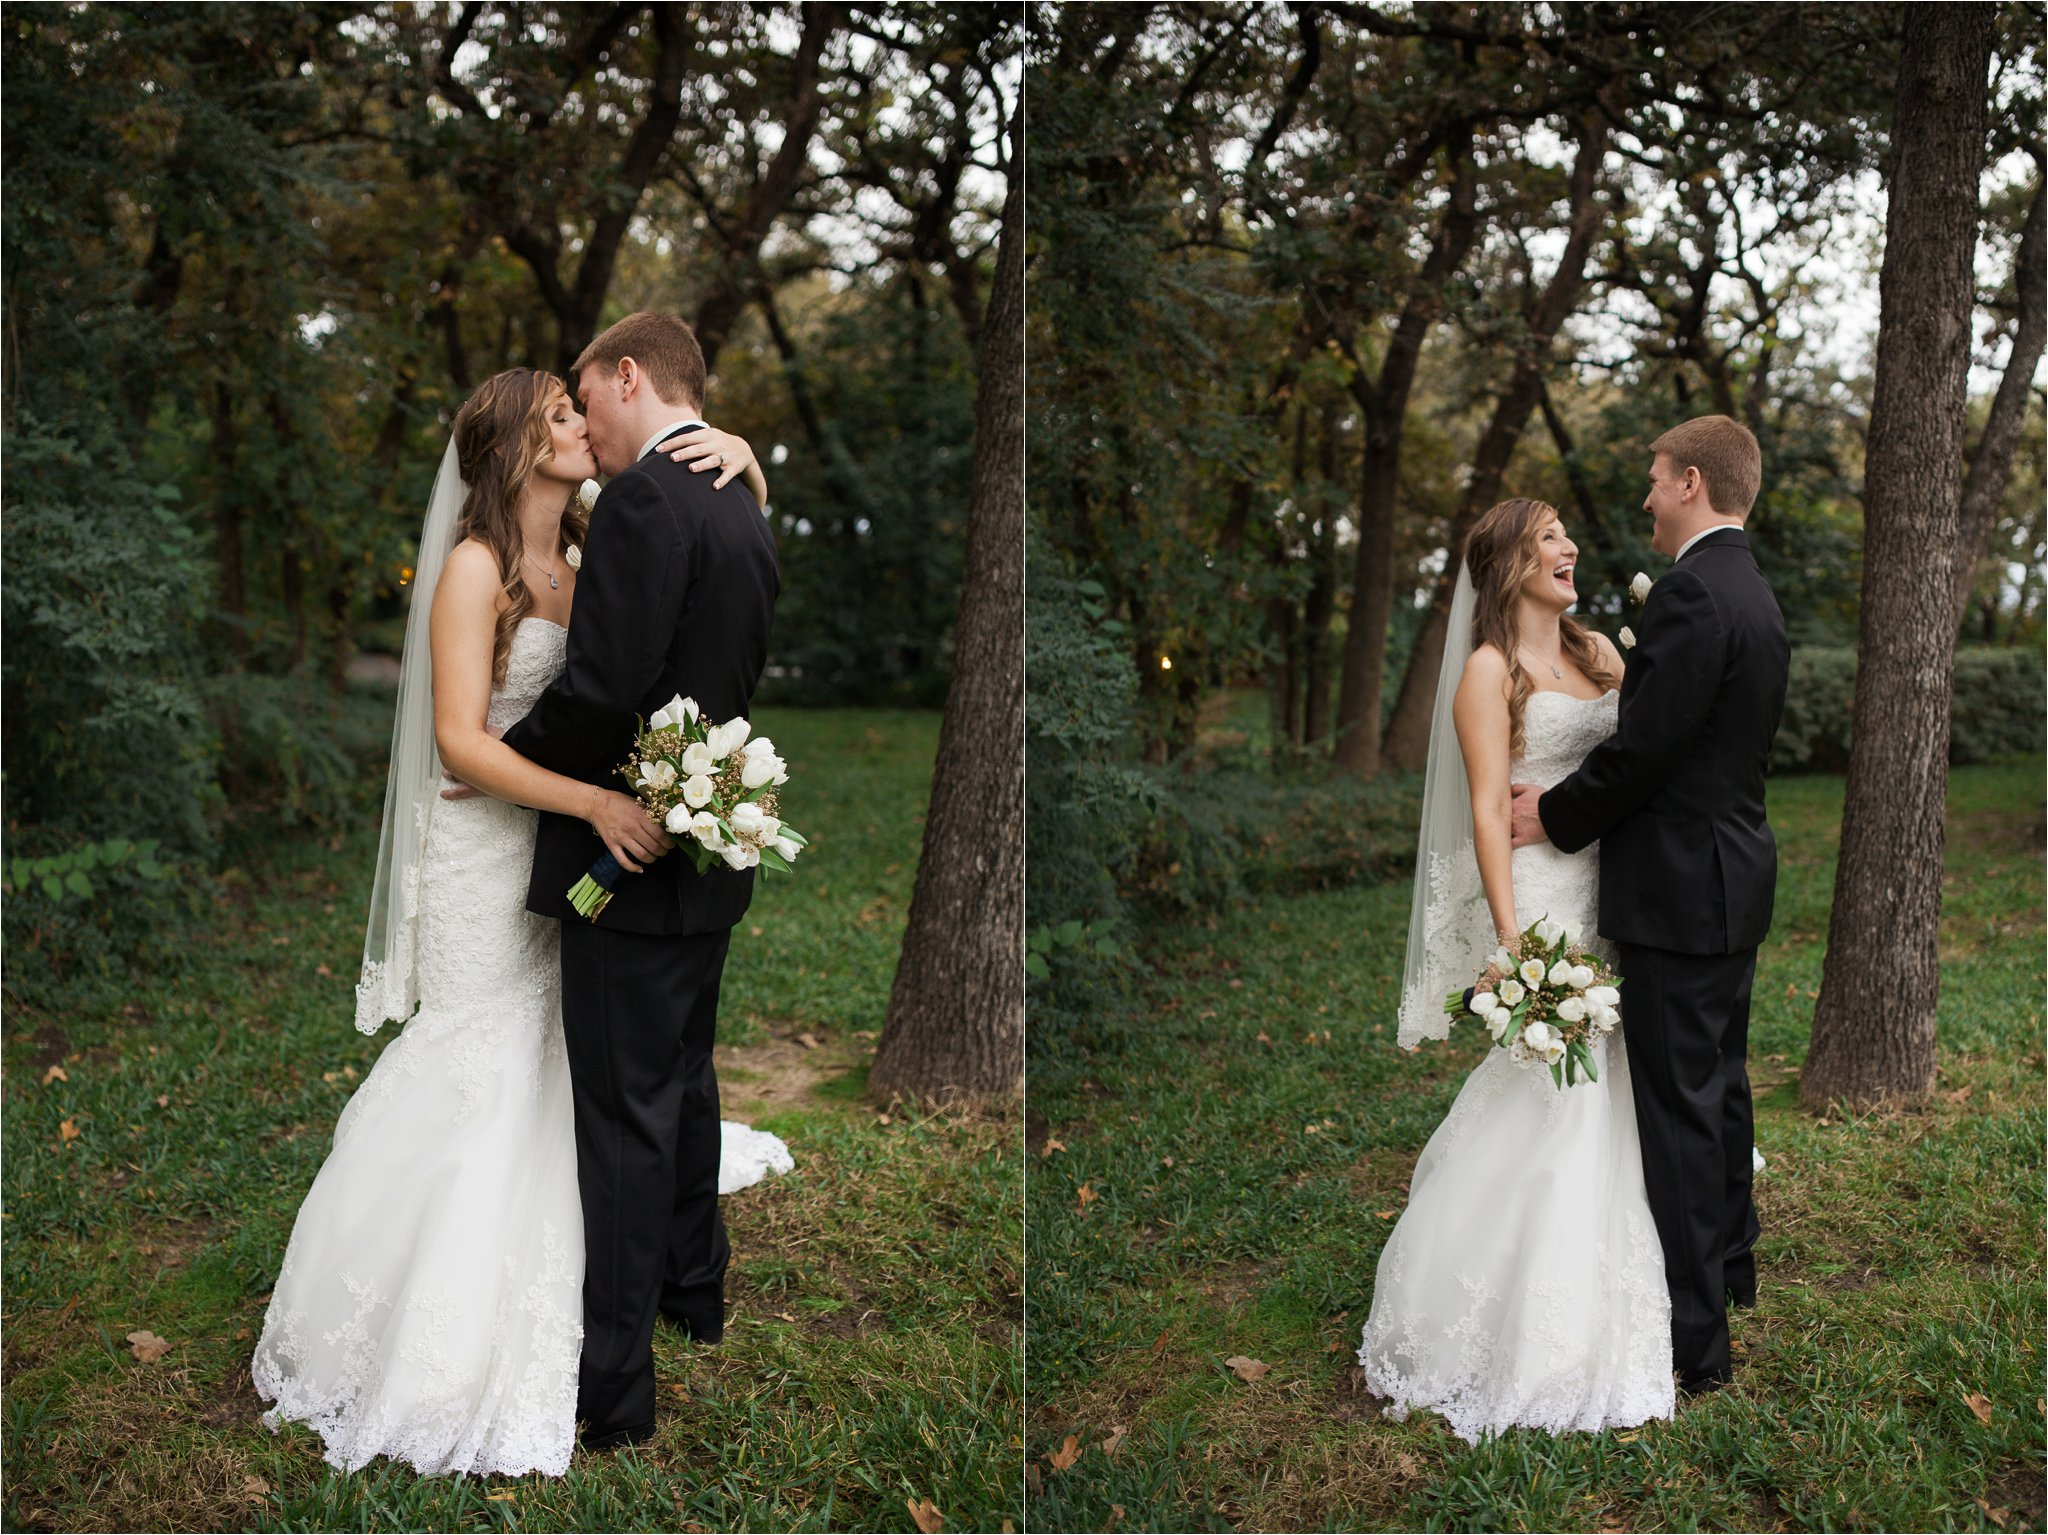 lunsford-wedding-653.jpg